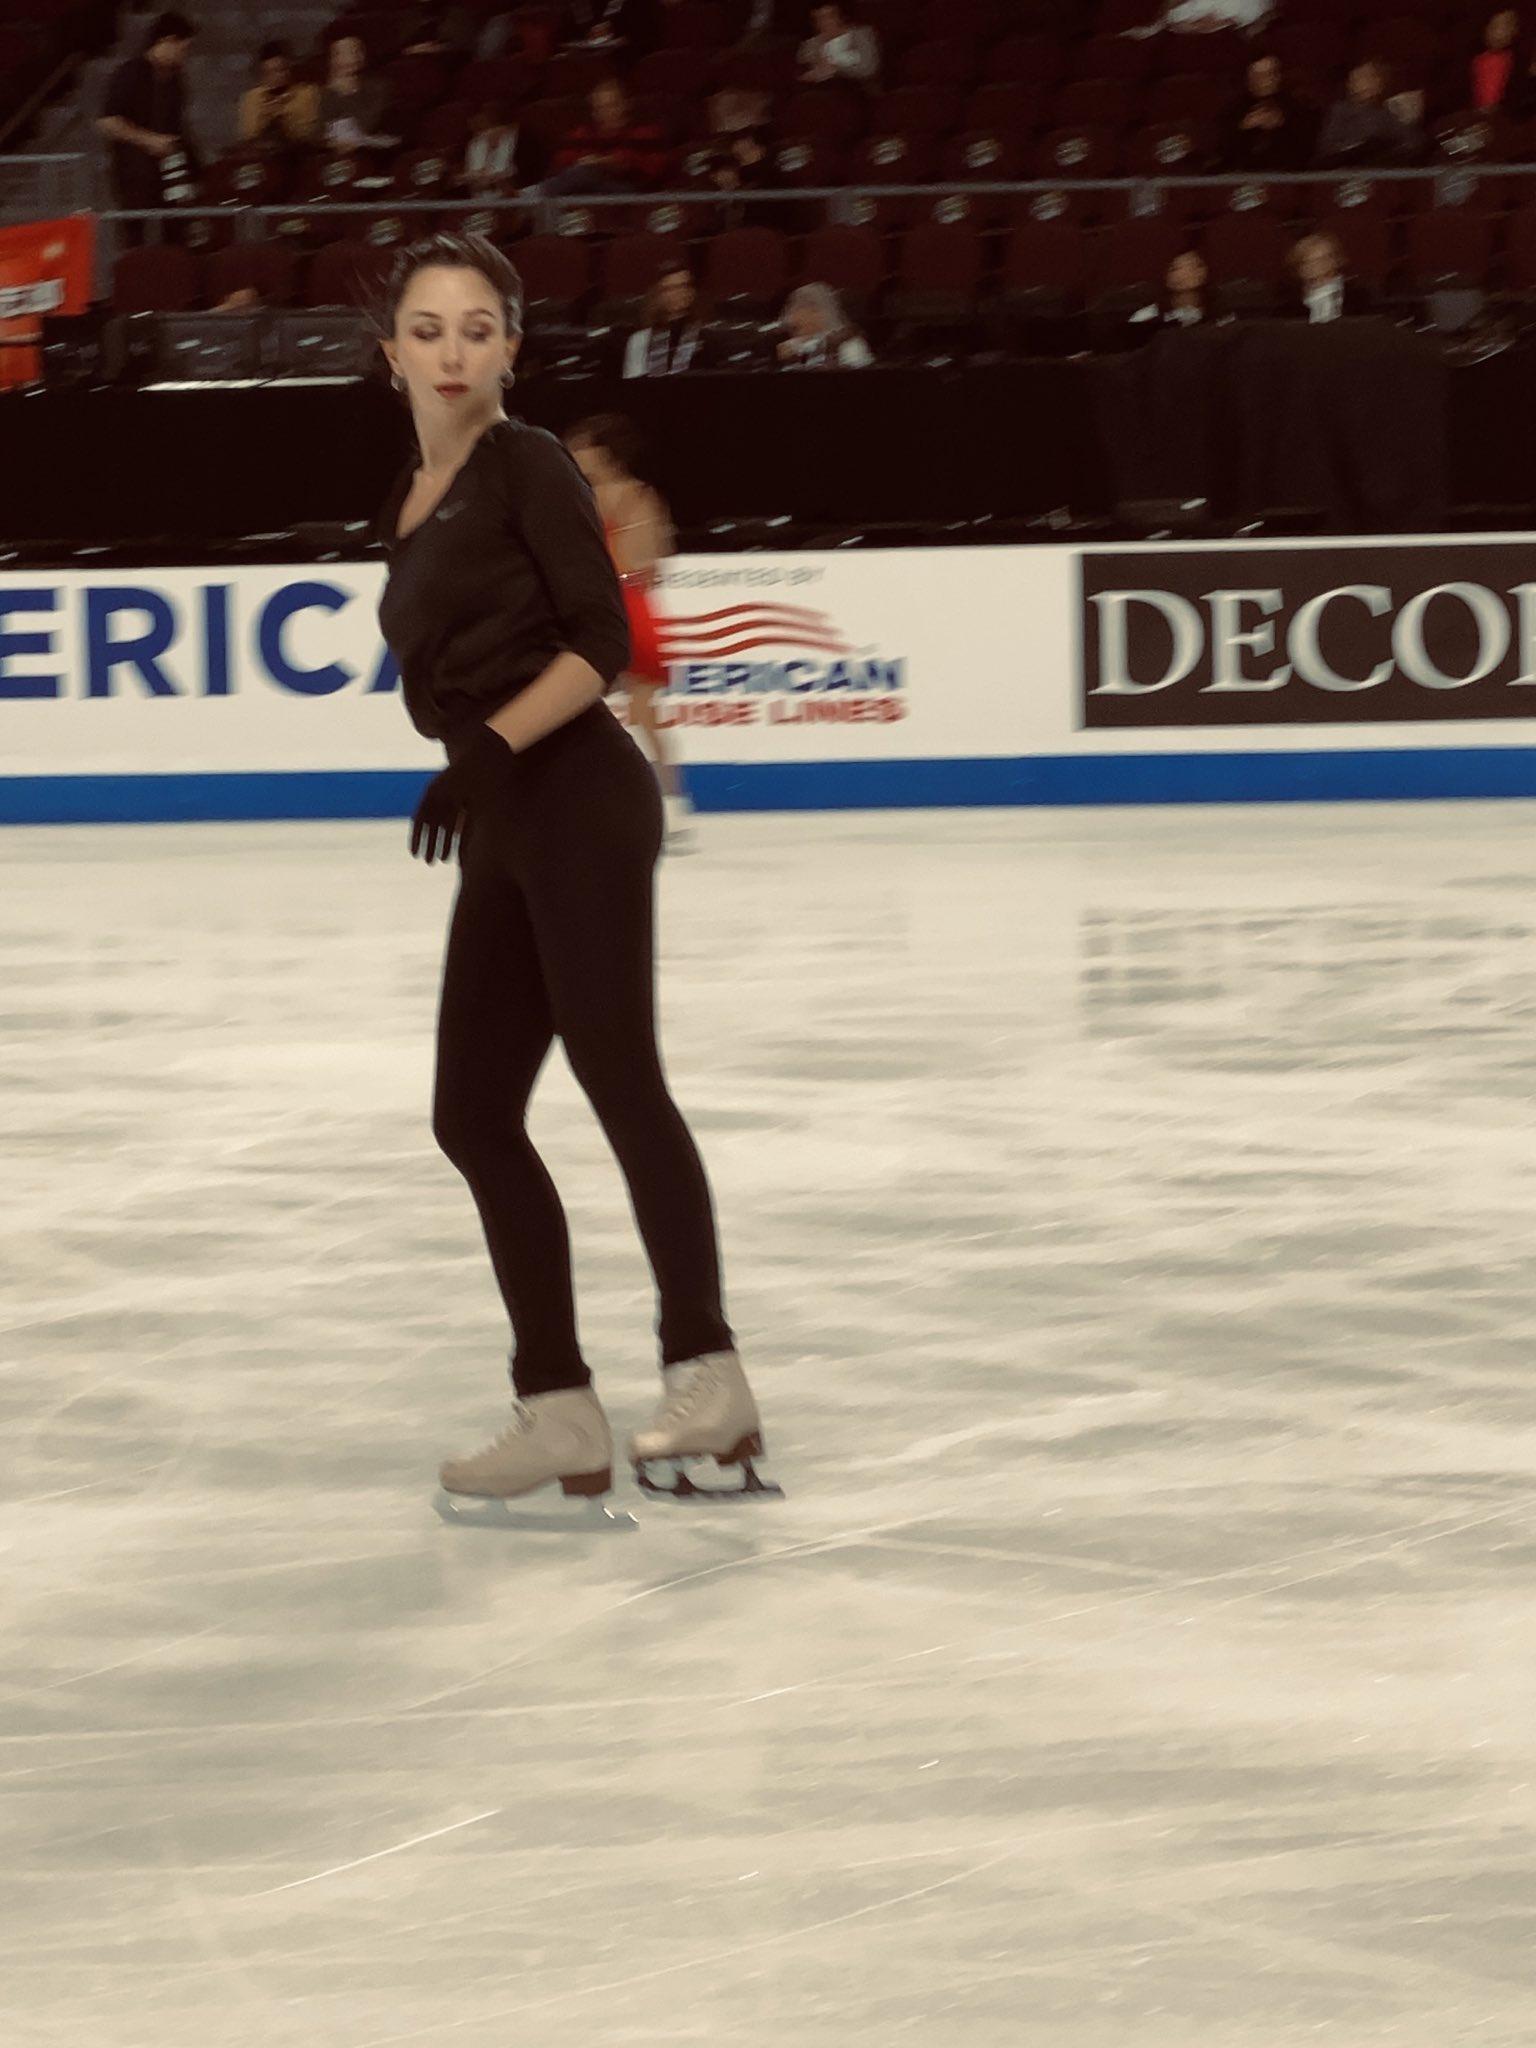 GP - 1 этап. Skate America Las Vegas, NV / USA October 18-20, 2019   - Страница 6 EHLyeOsW4AEB4KY?format=jpg&name=4096x4096